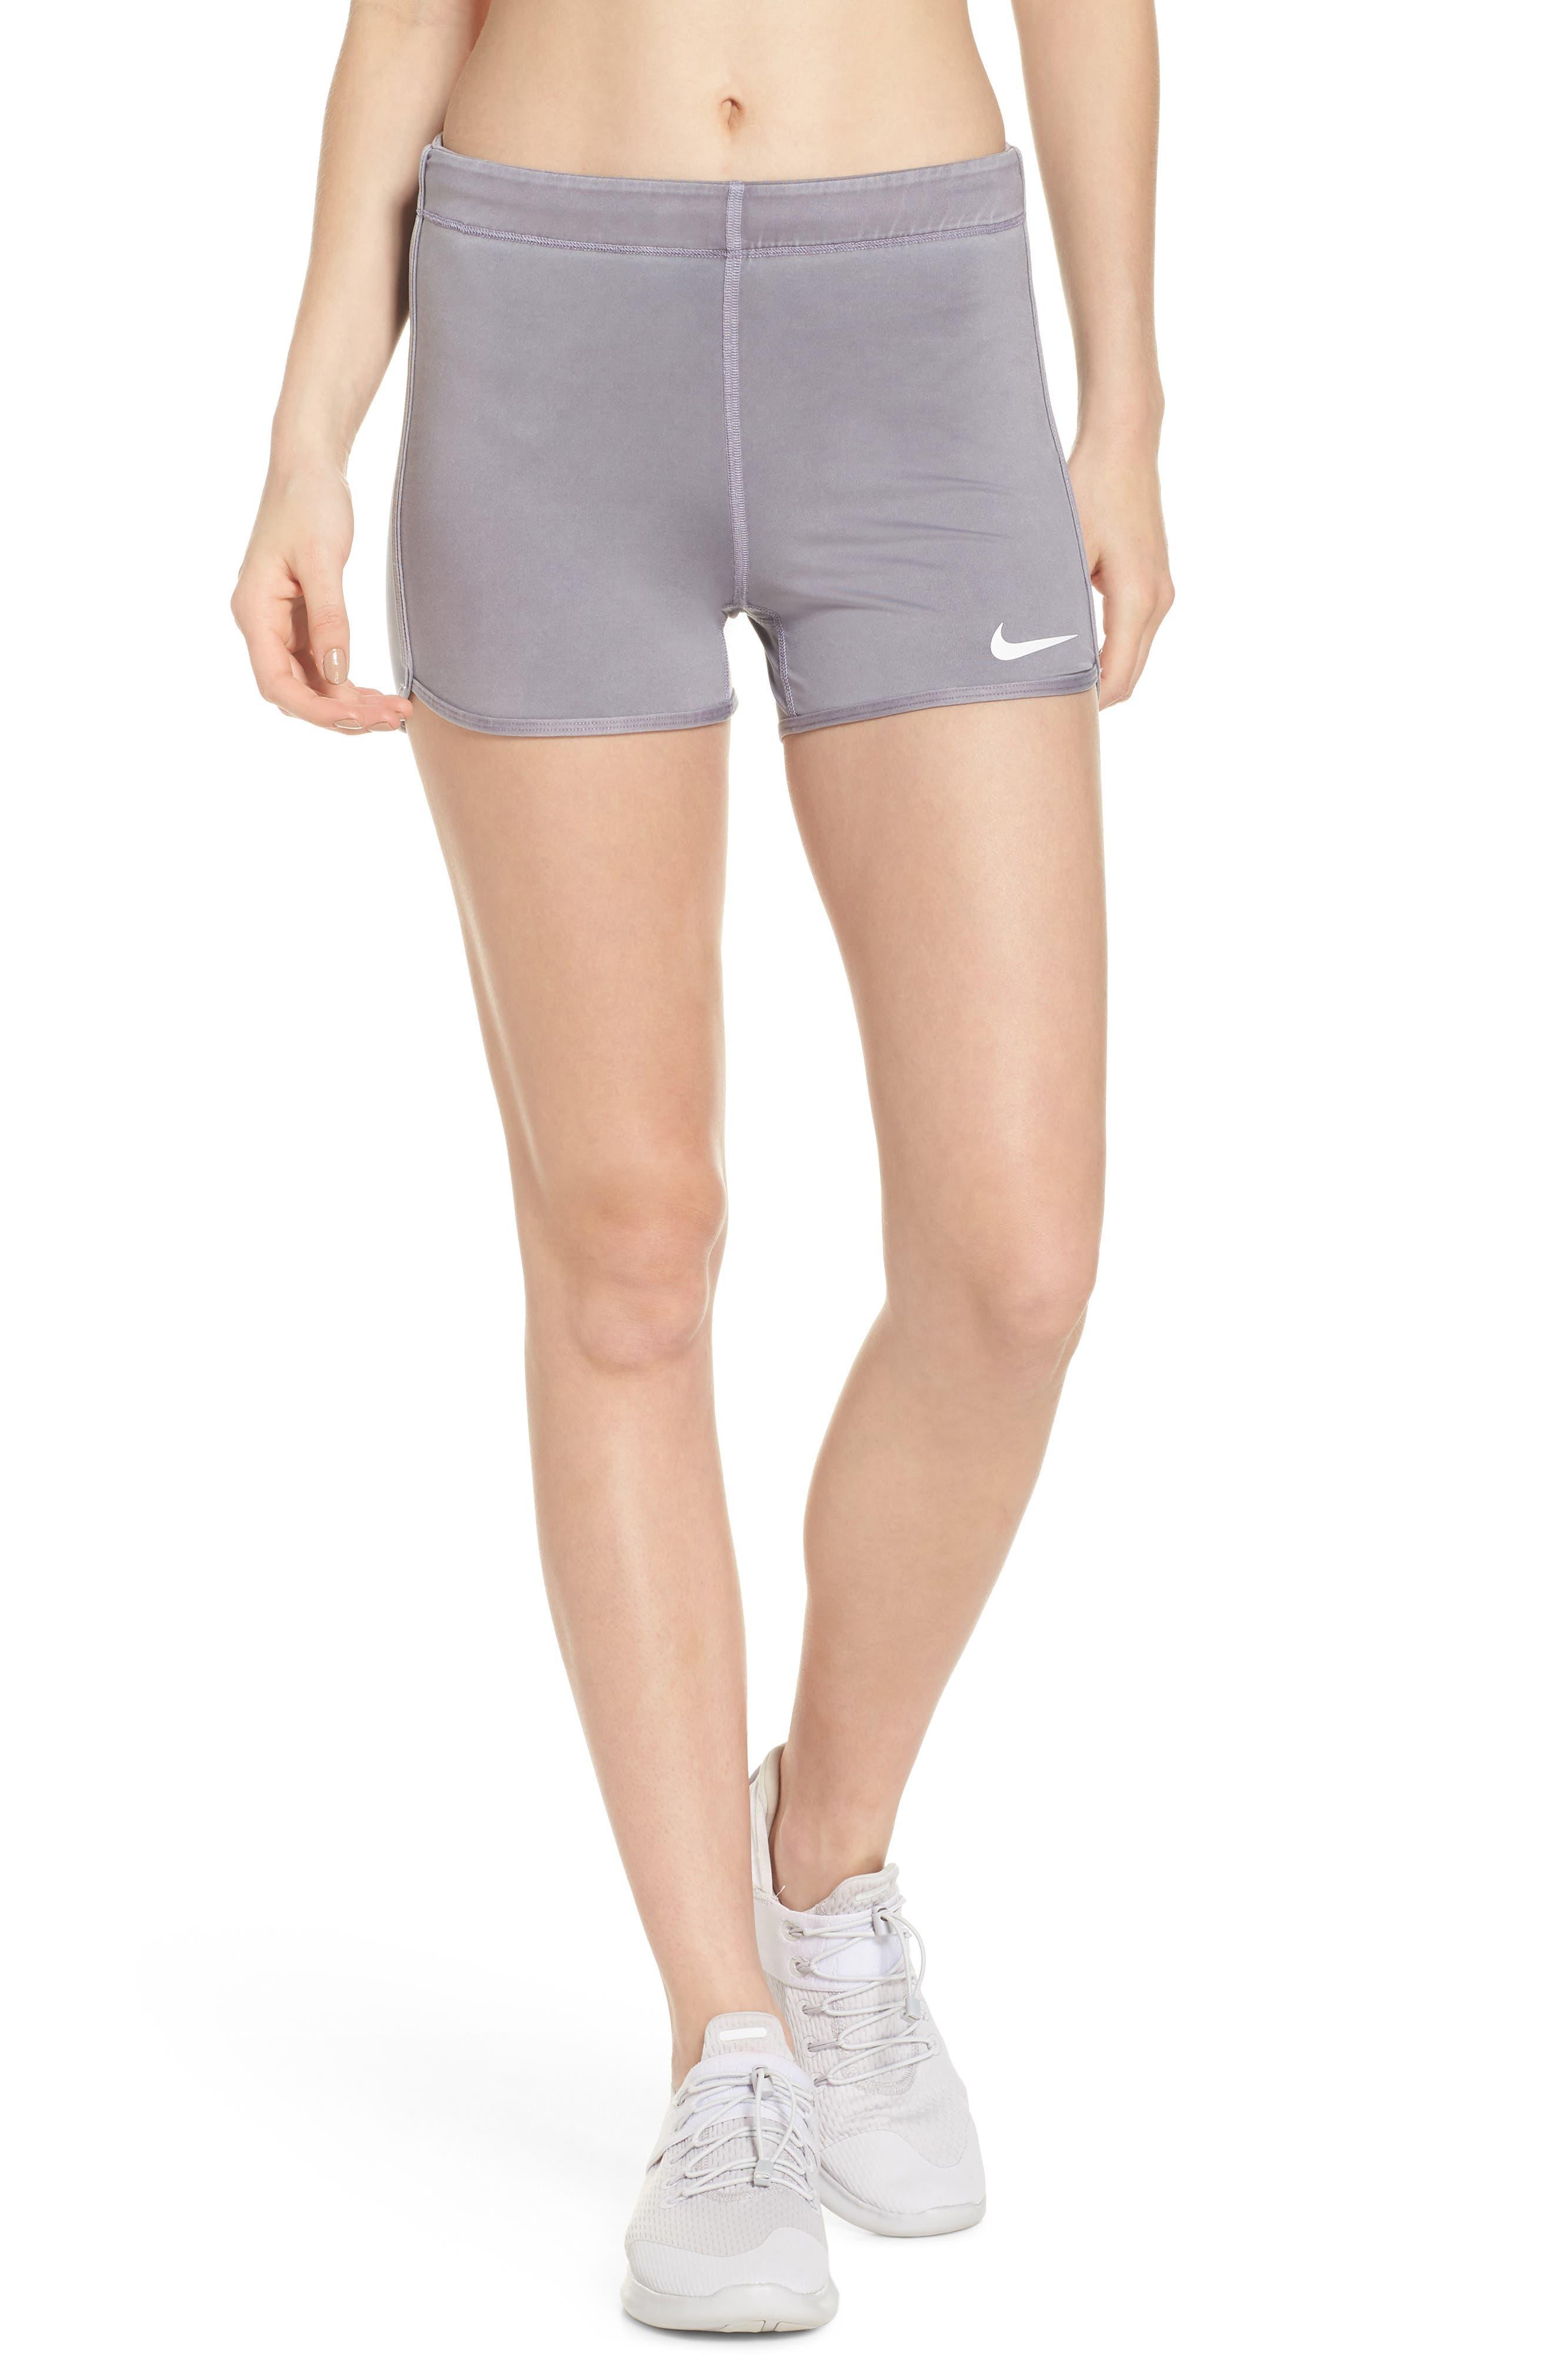 Pro Vintage Shorts,                             Main thumbnail 1, color,                             Dark Grey/ White